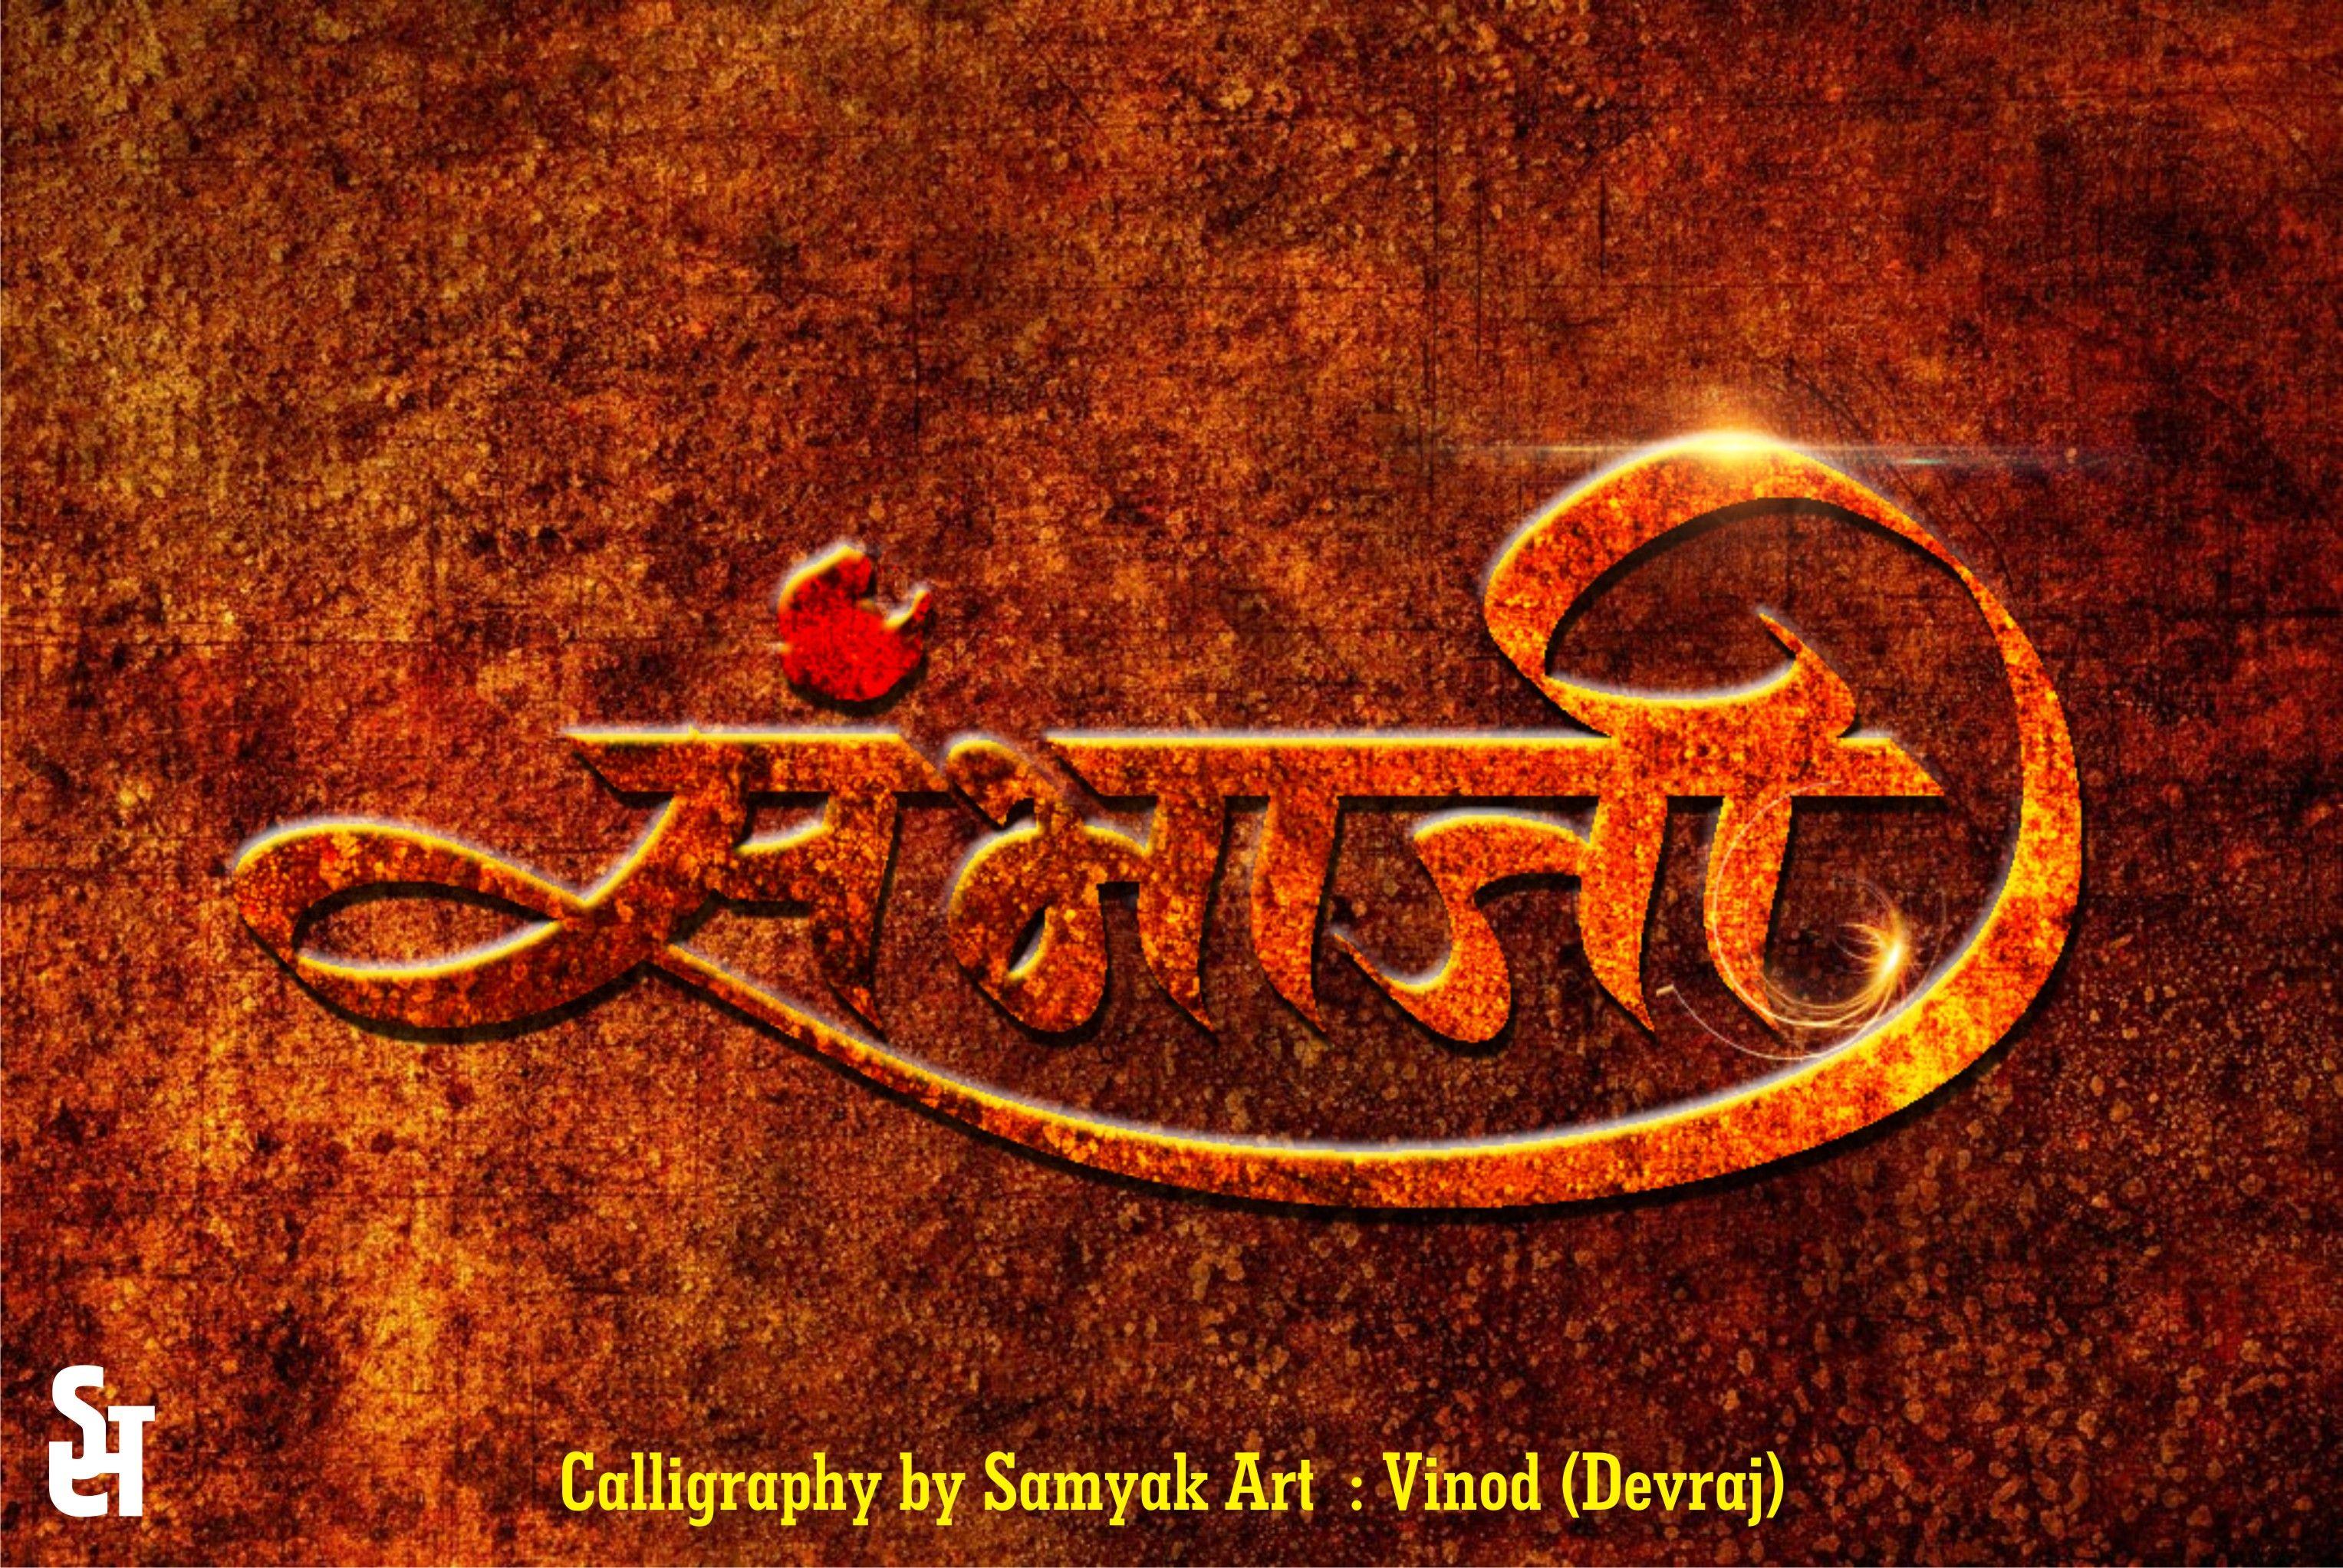 sambhaji marathi marathi calligraphy calligraphy shambhu chhava